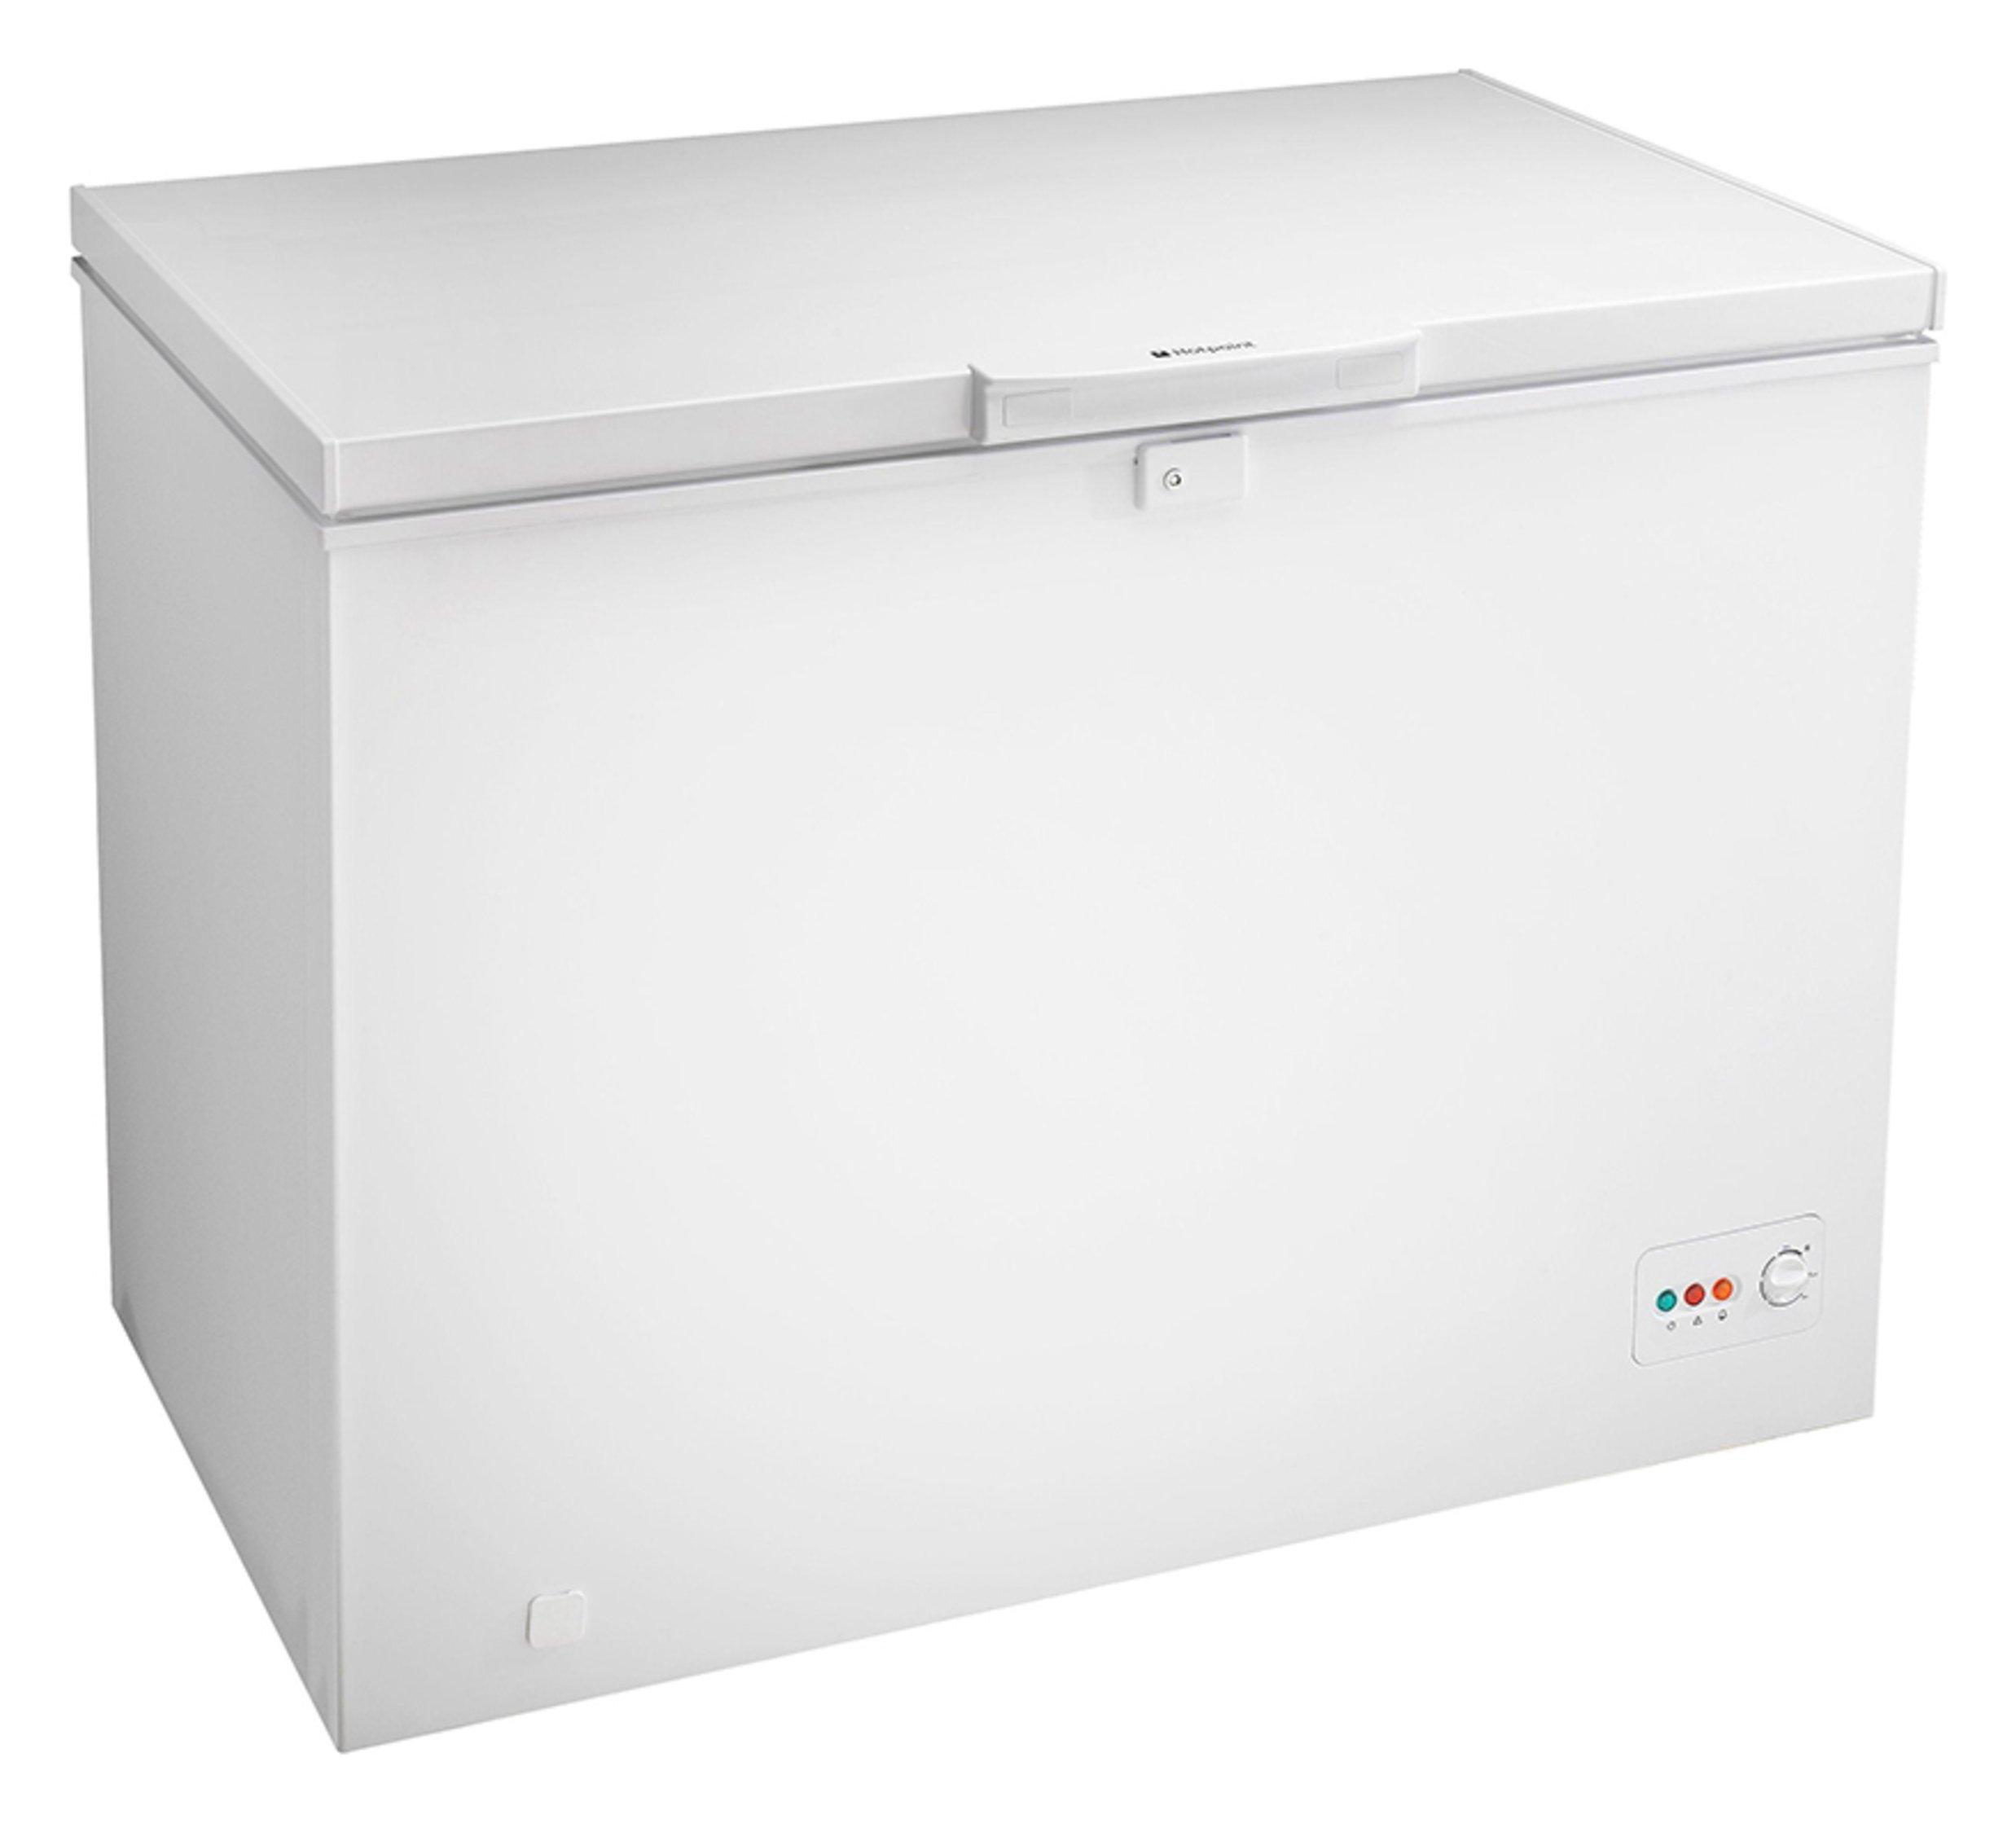 hotpoint-cs1a250h-chest-freezer-white